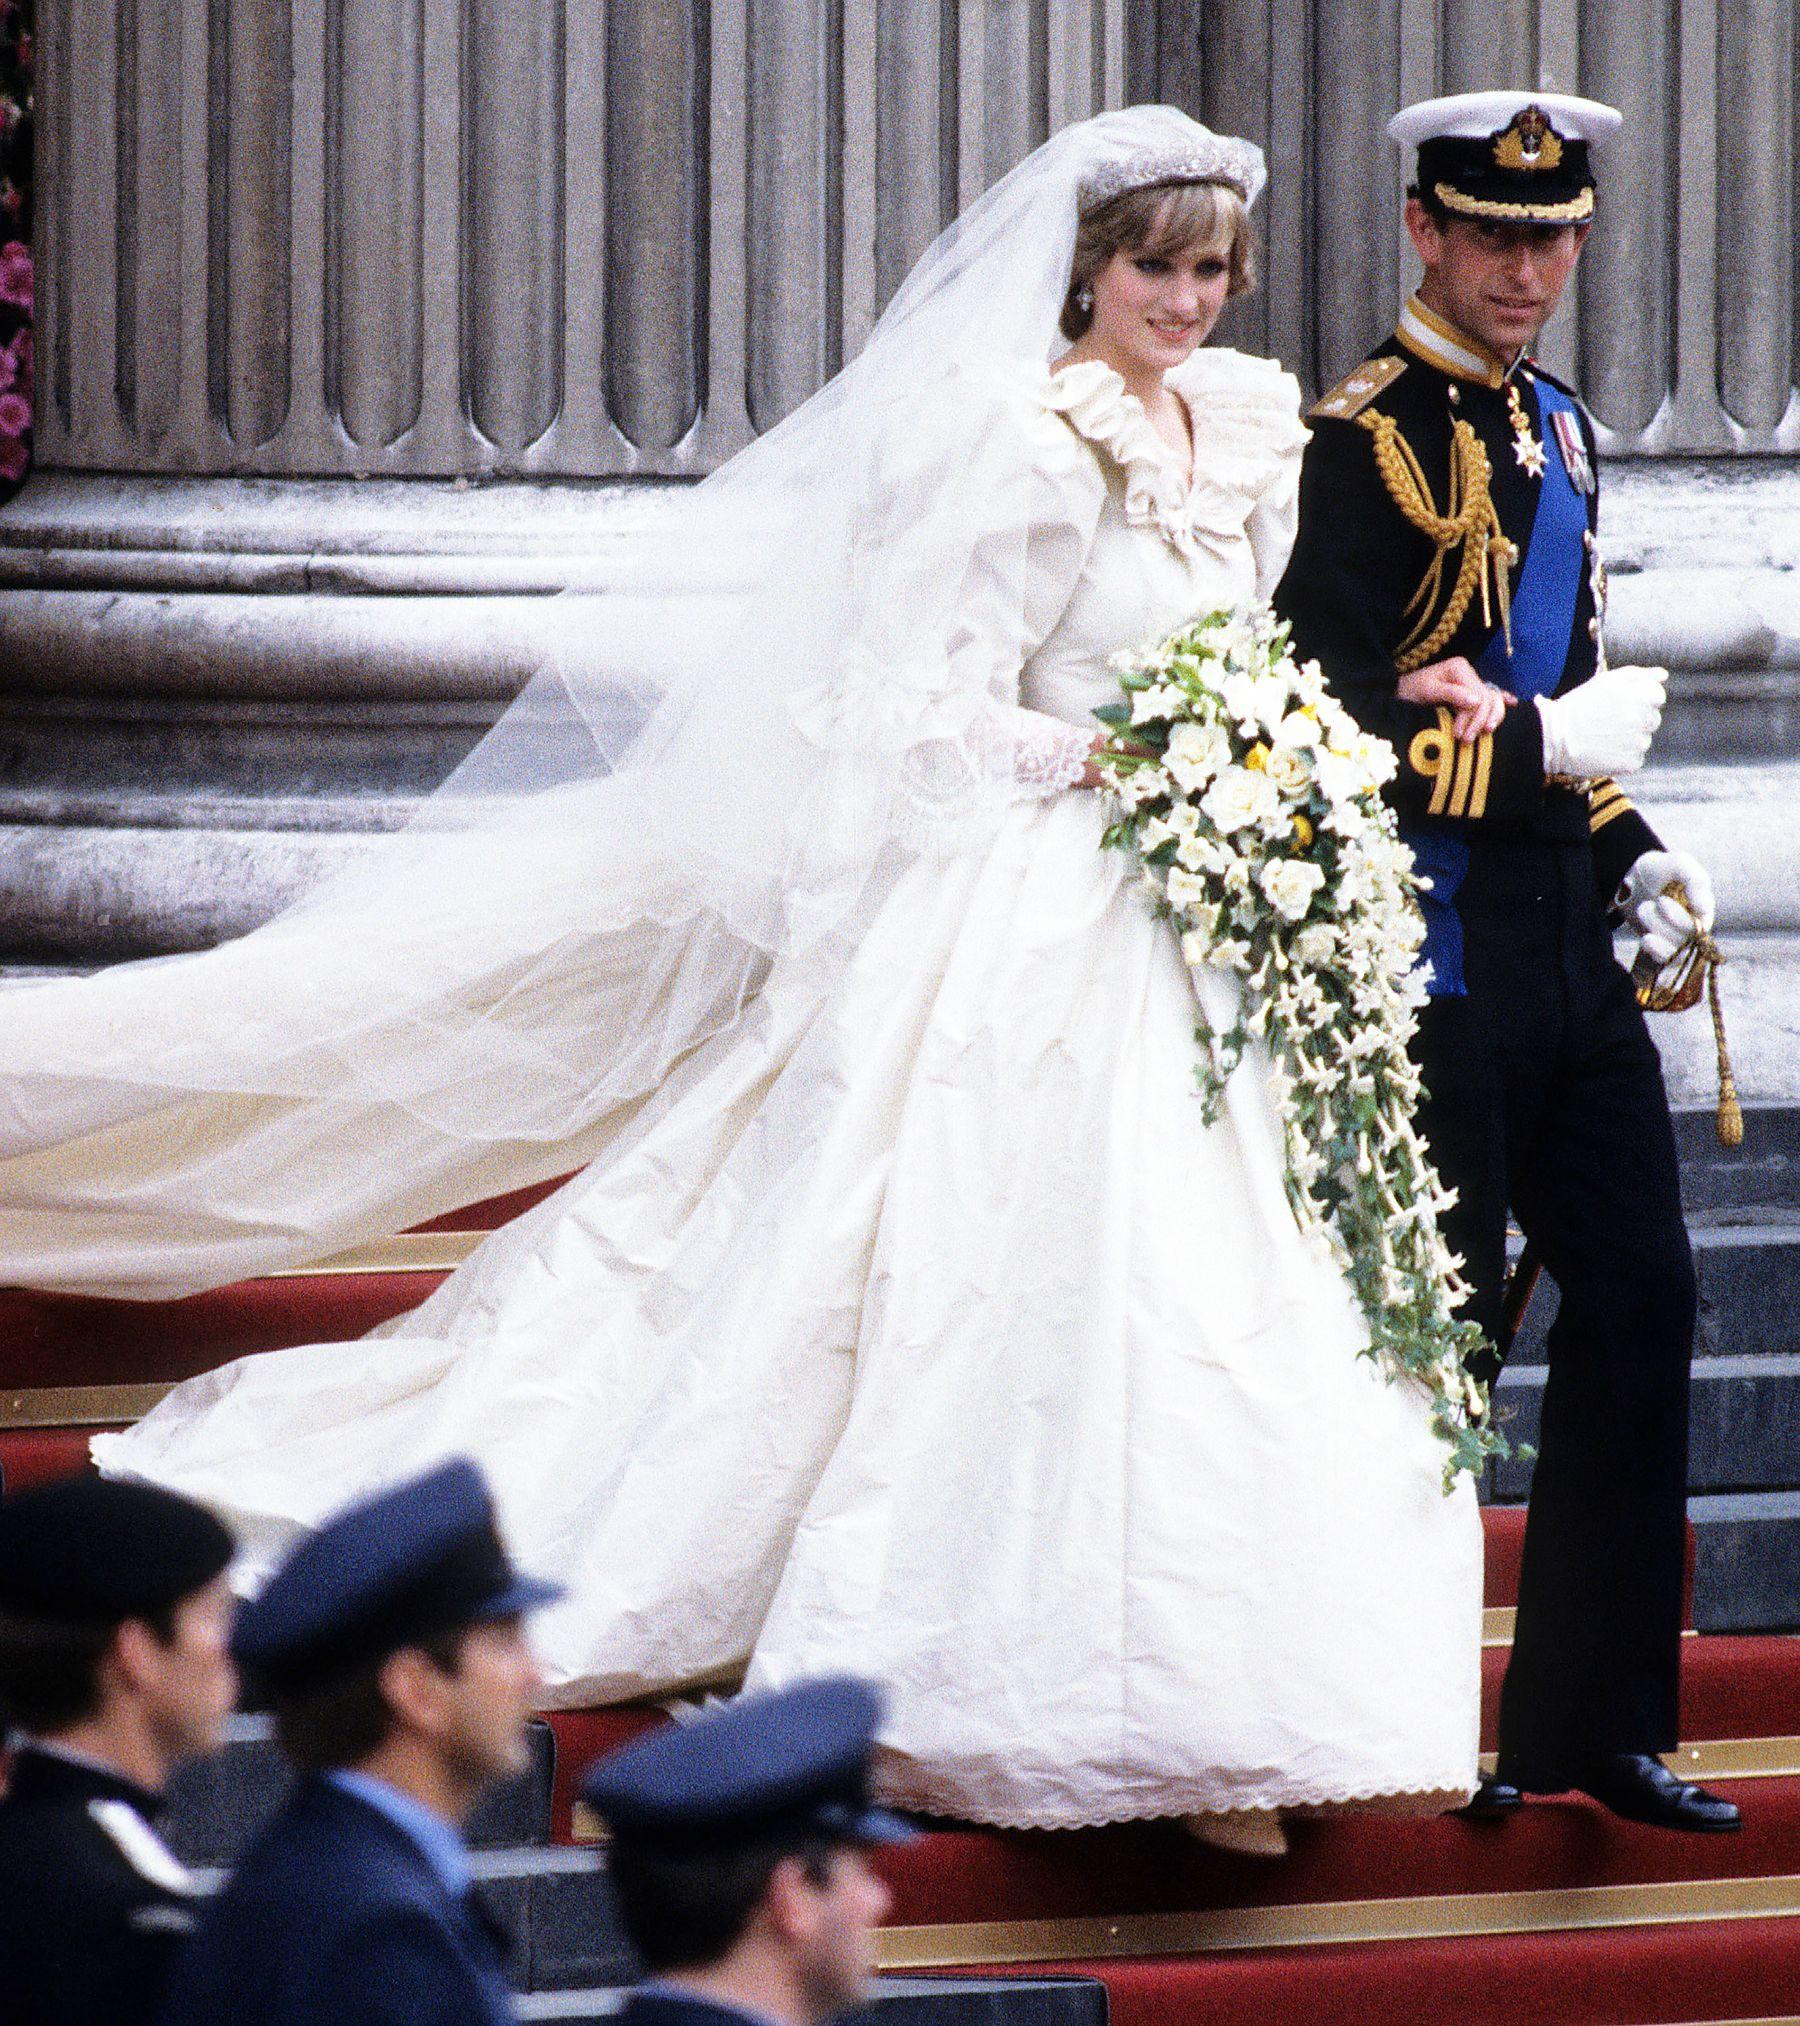 Princess Diana S Wedding Dress Designer Praises Meghan Markle S Elegant And Classic Gown Princess Diana Wedding Dress Royal Wedding Gowns Diana Wedding [ 2026 x 1800 Pixel ]